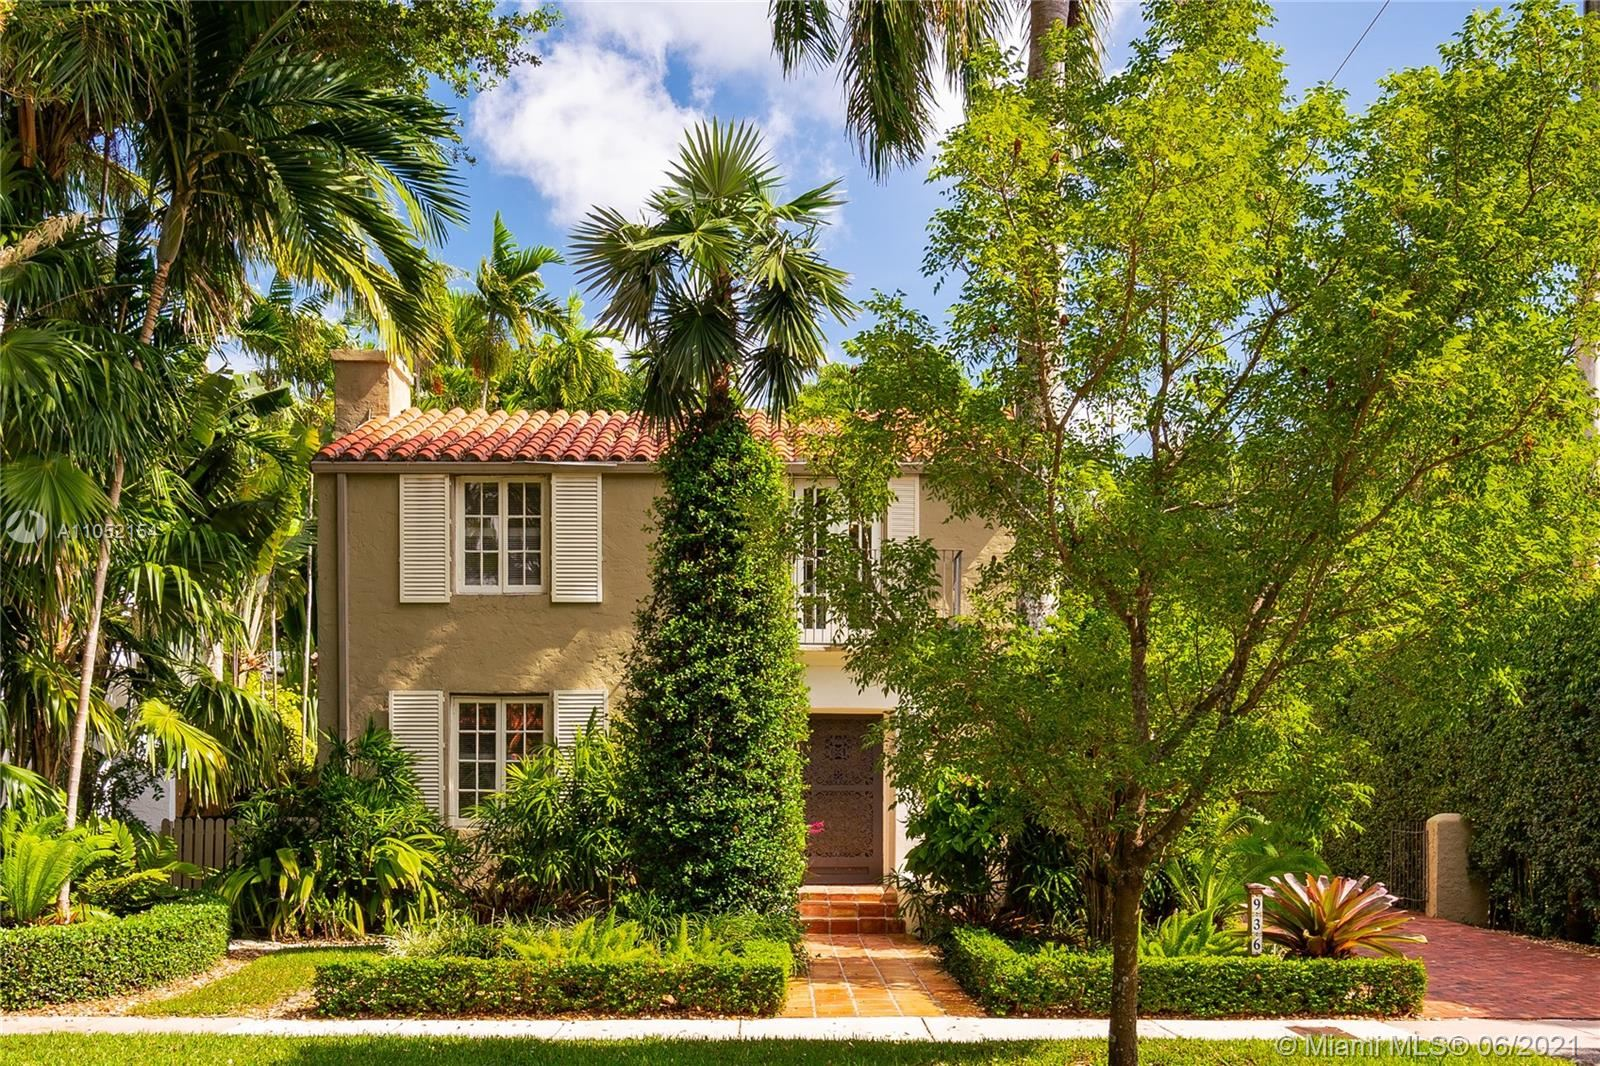 936 Sorolla Ave, Coral Gables, FL 33134 - #: A11052154